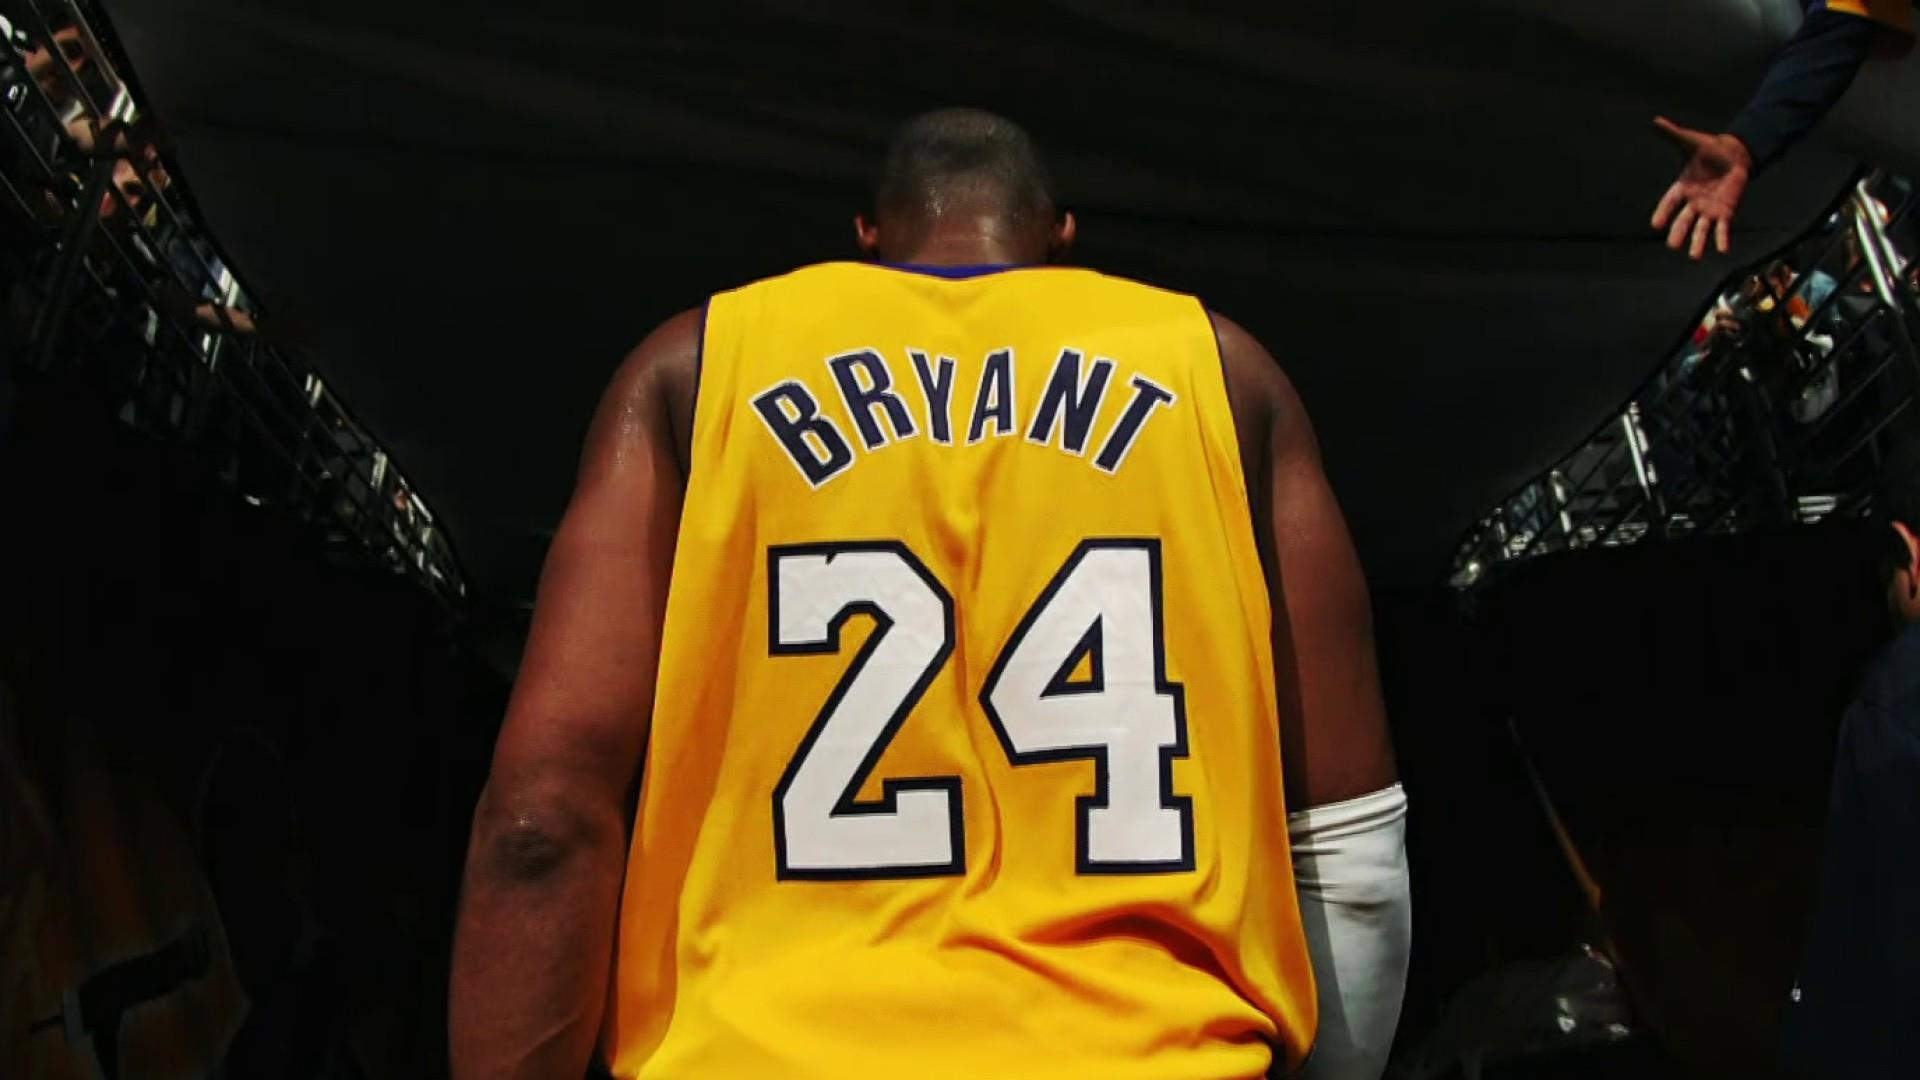 stunned Kobe Bryant fans gather